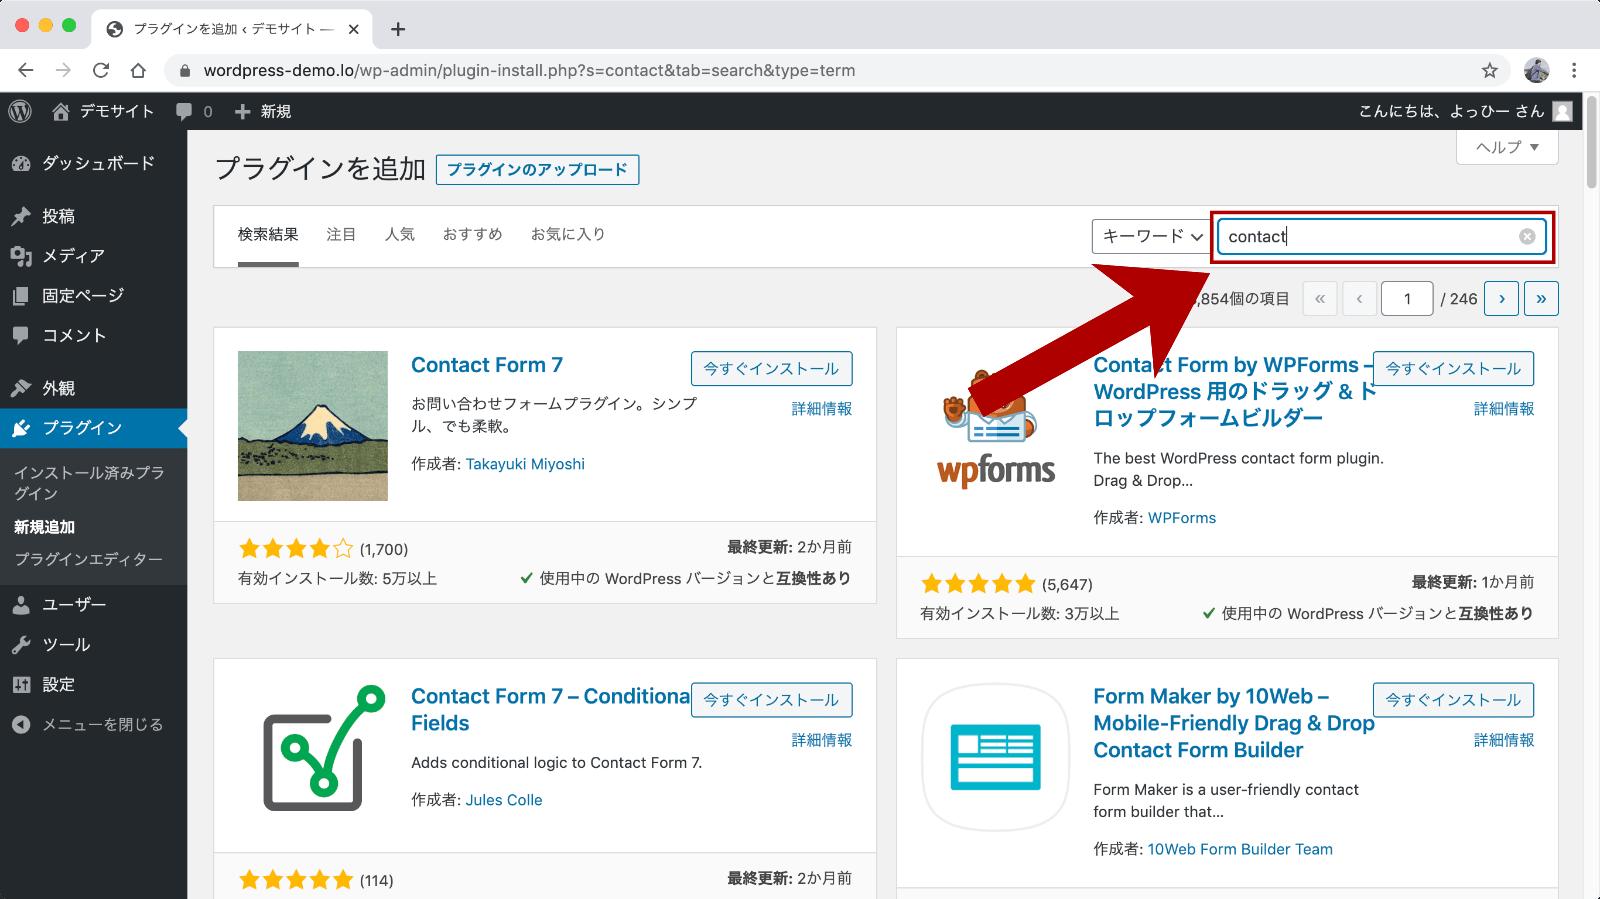 WordPressプラグインを検索